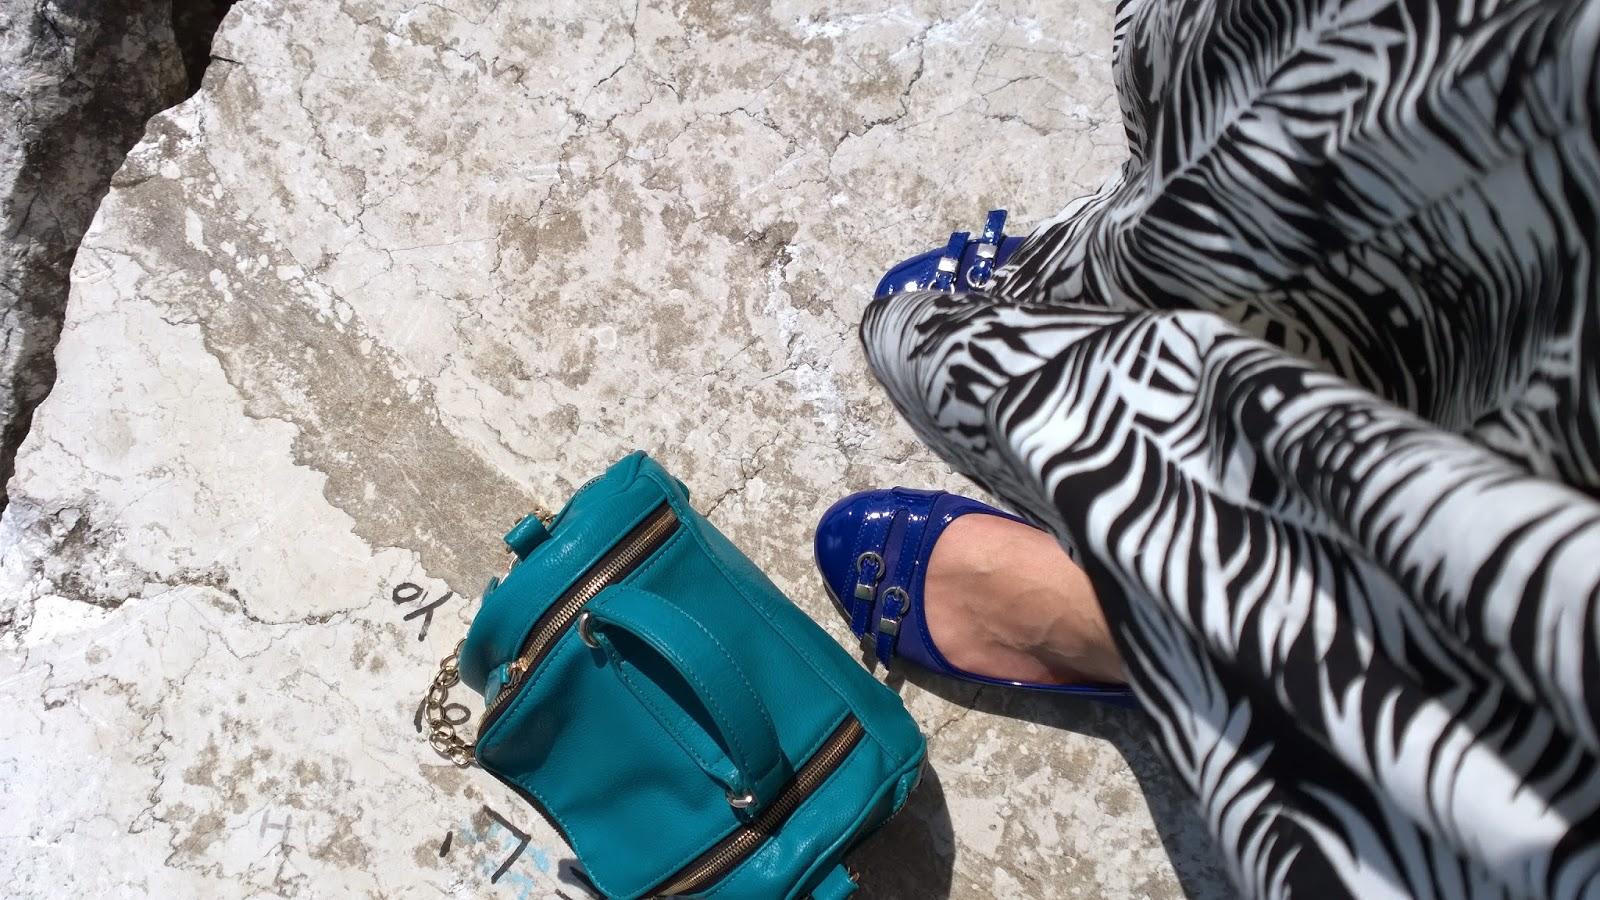 Blue flats, emerald bag, printed skirt